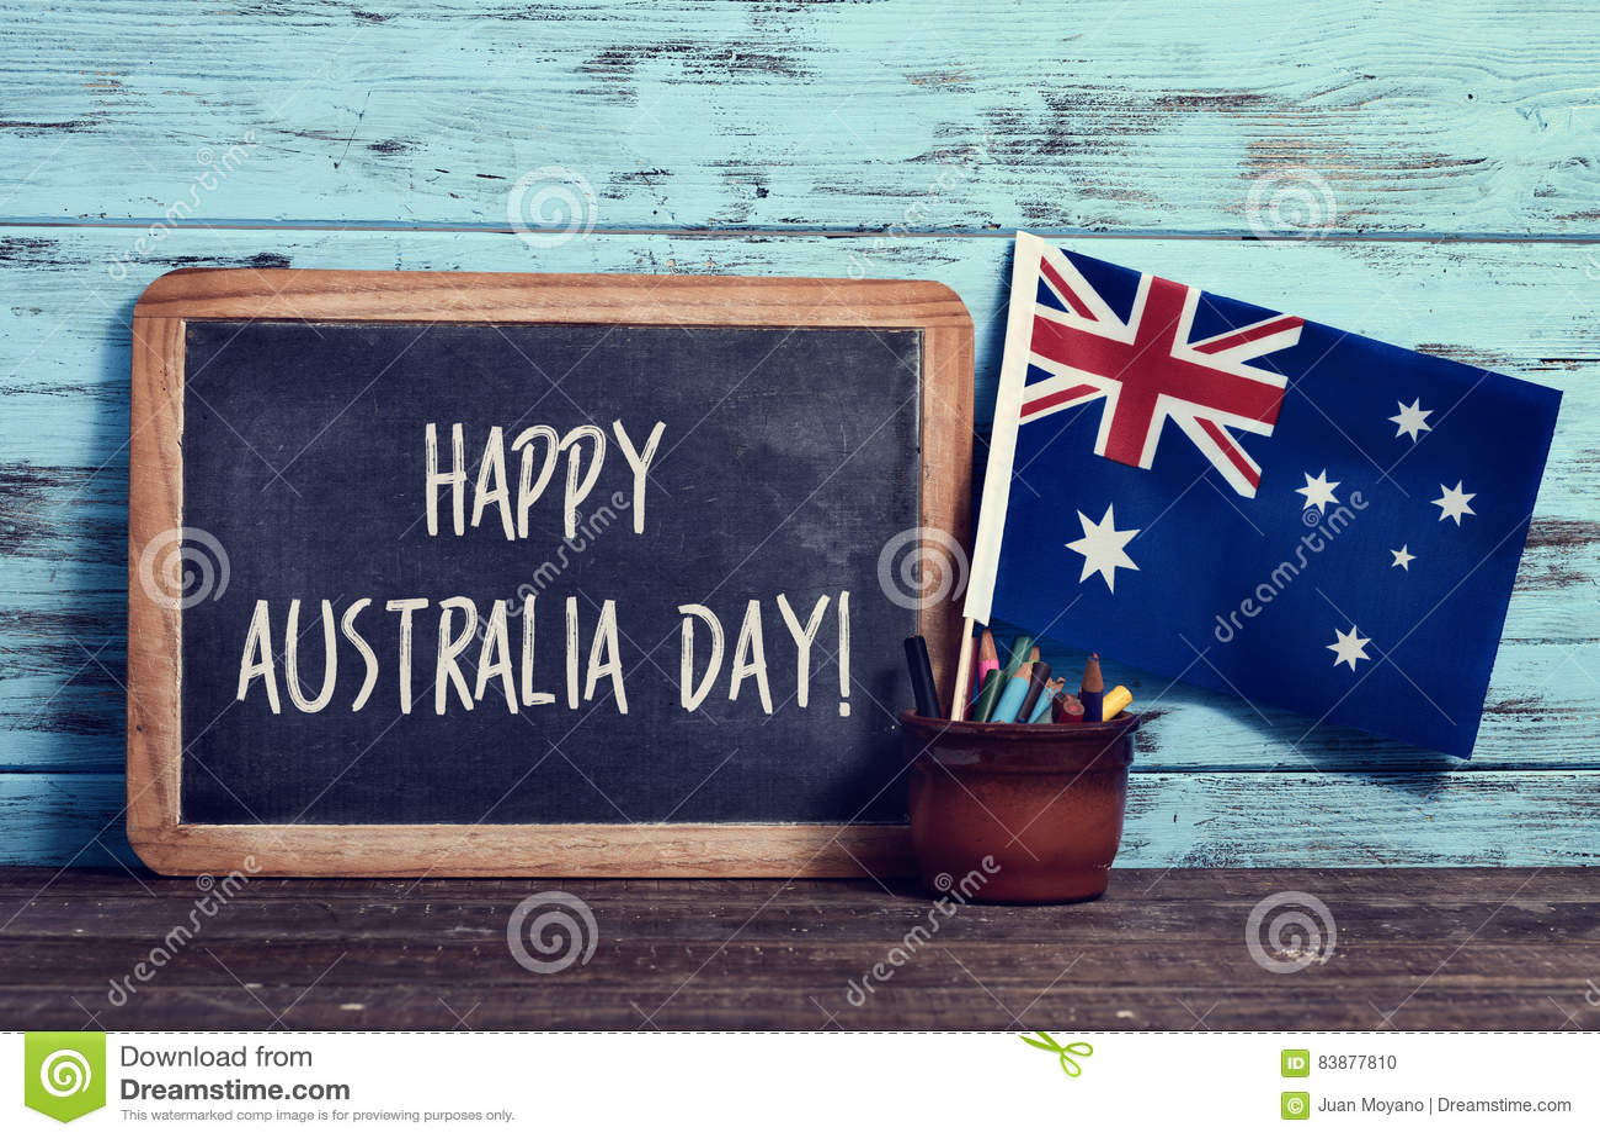 Add days to date online in Australia